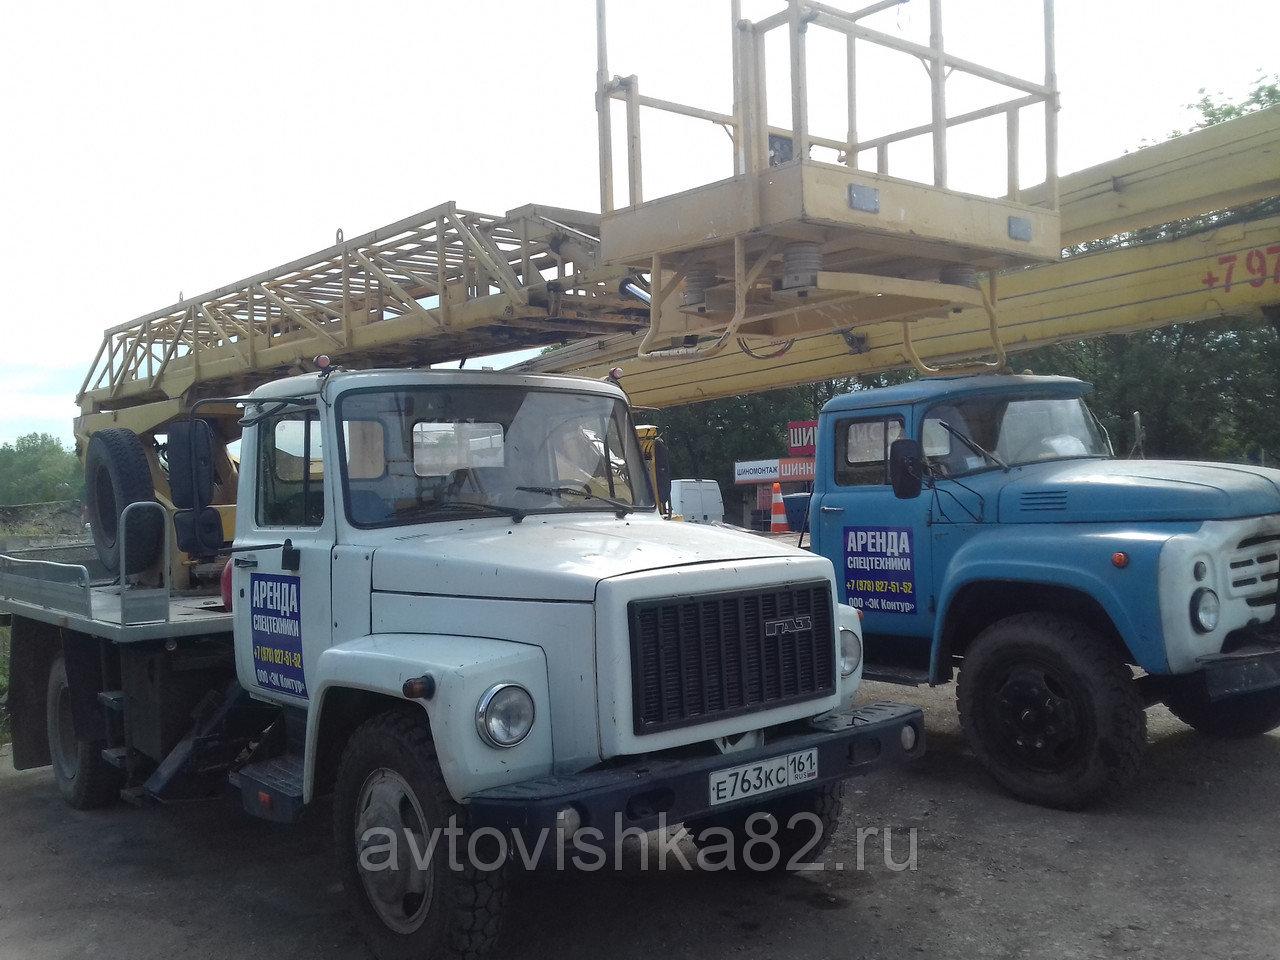 Аренда Автовышки Крым